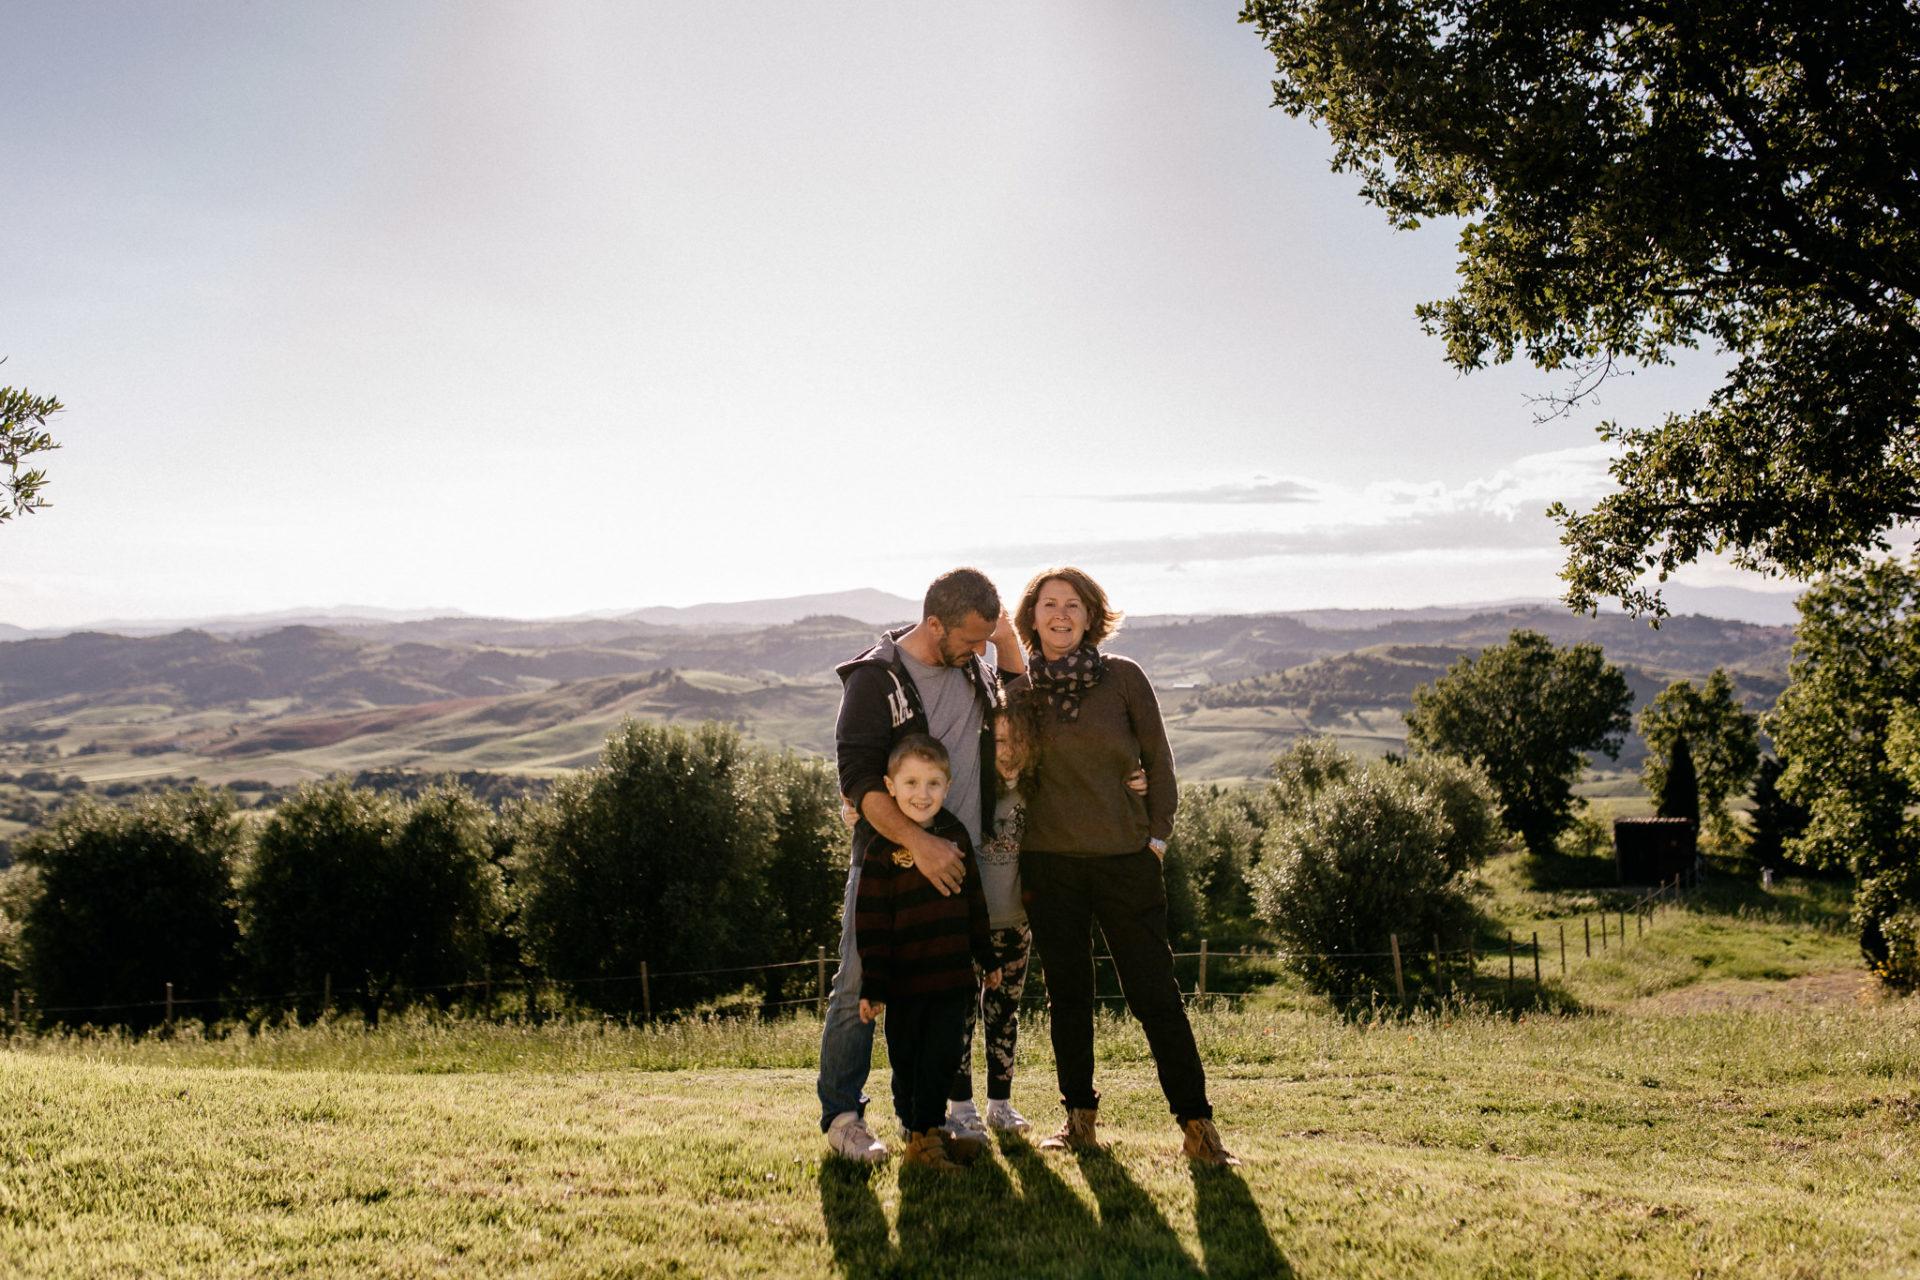 family photos holiday tuscany-intimate family portrait-dimora santa margherita-travel italy-family photographer stuttgart